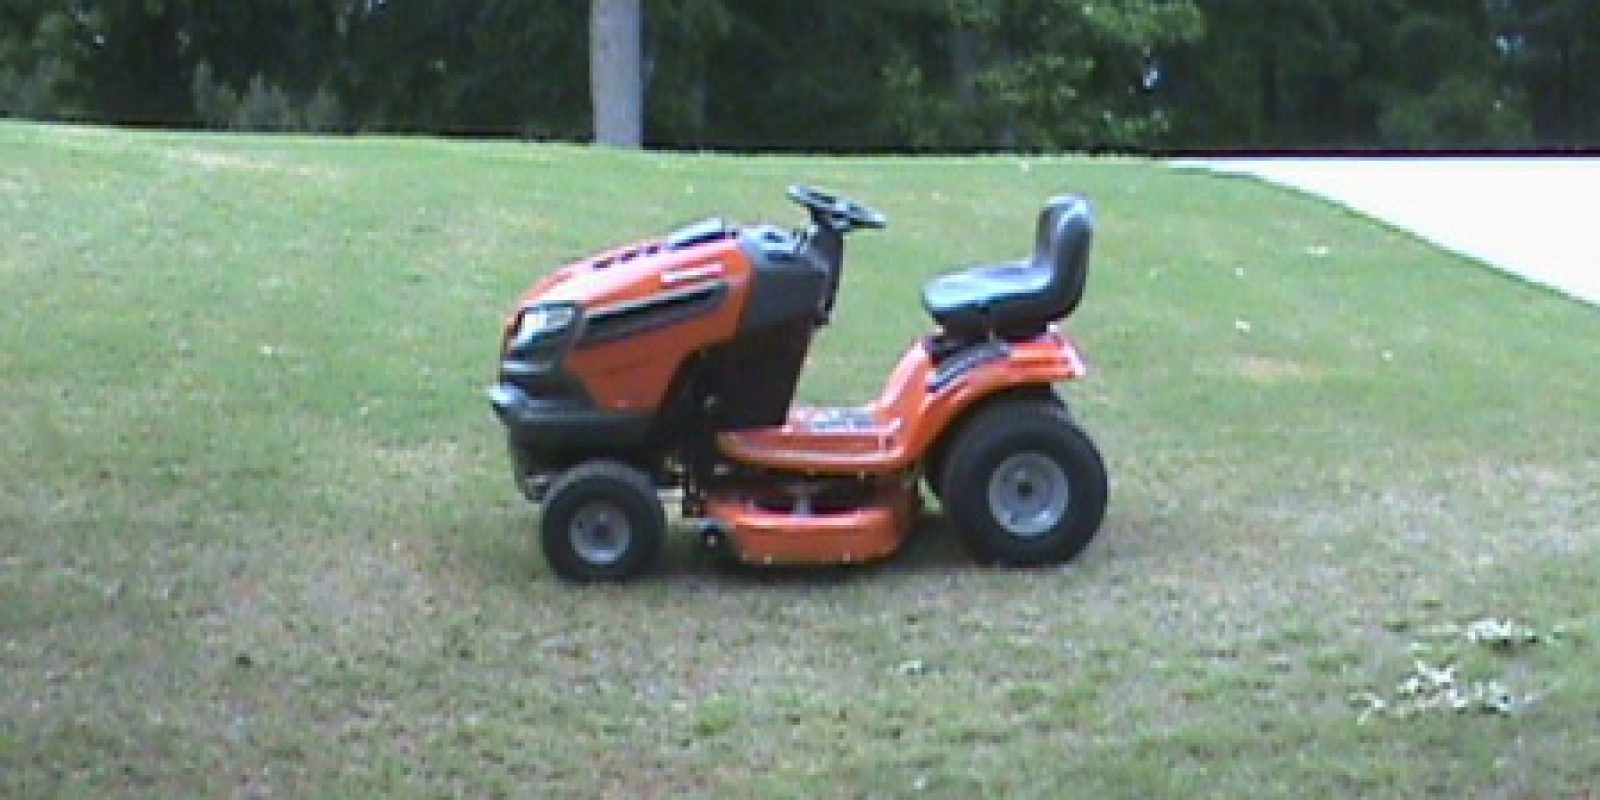 Husqvarna Yth18542 Review A Truly Impressive Garden Tractor